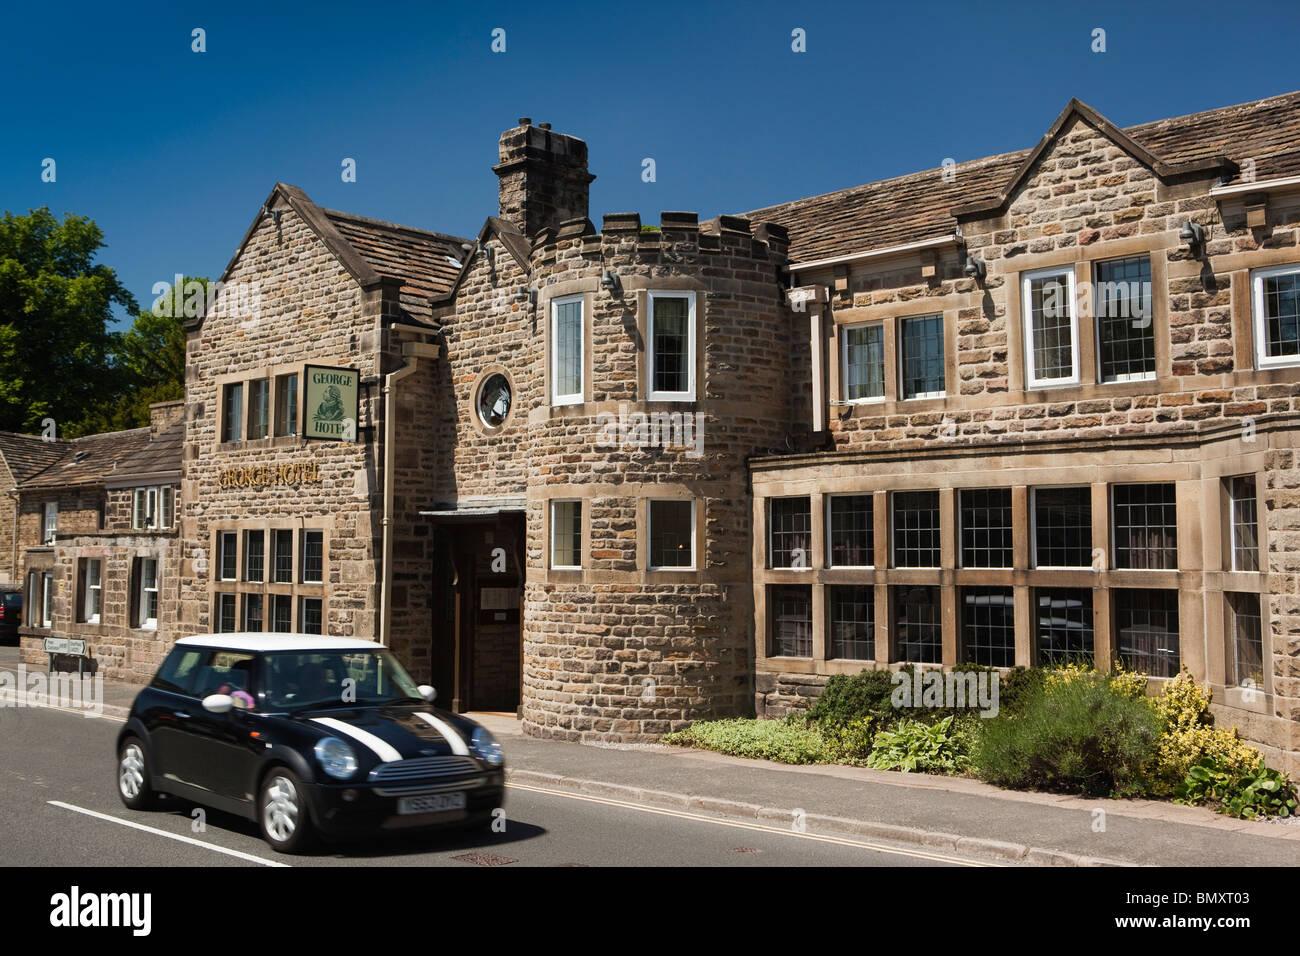 UK, England, Derbyshire, Peak District, Hathersage, Main Street, George Hotel - Stock Image